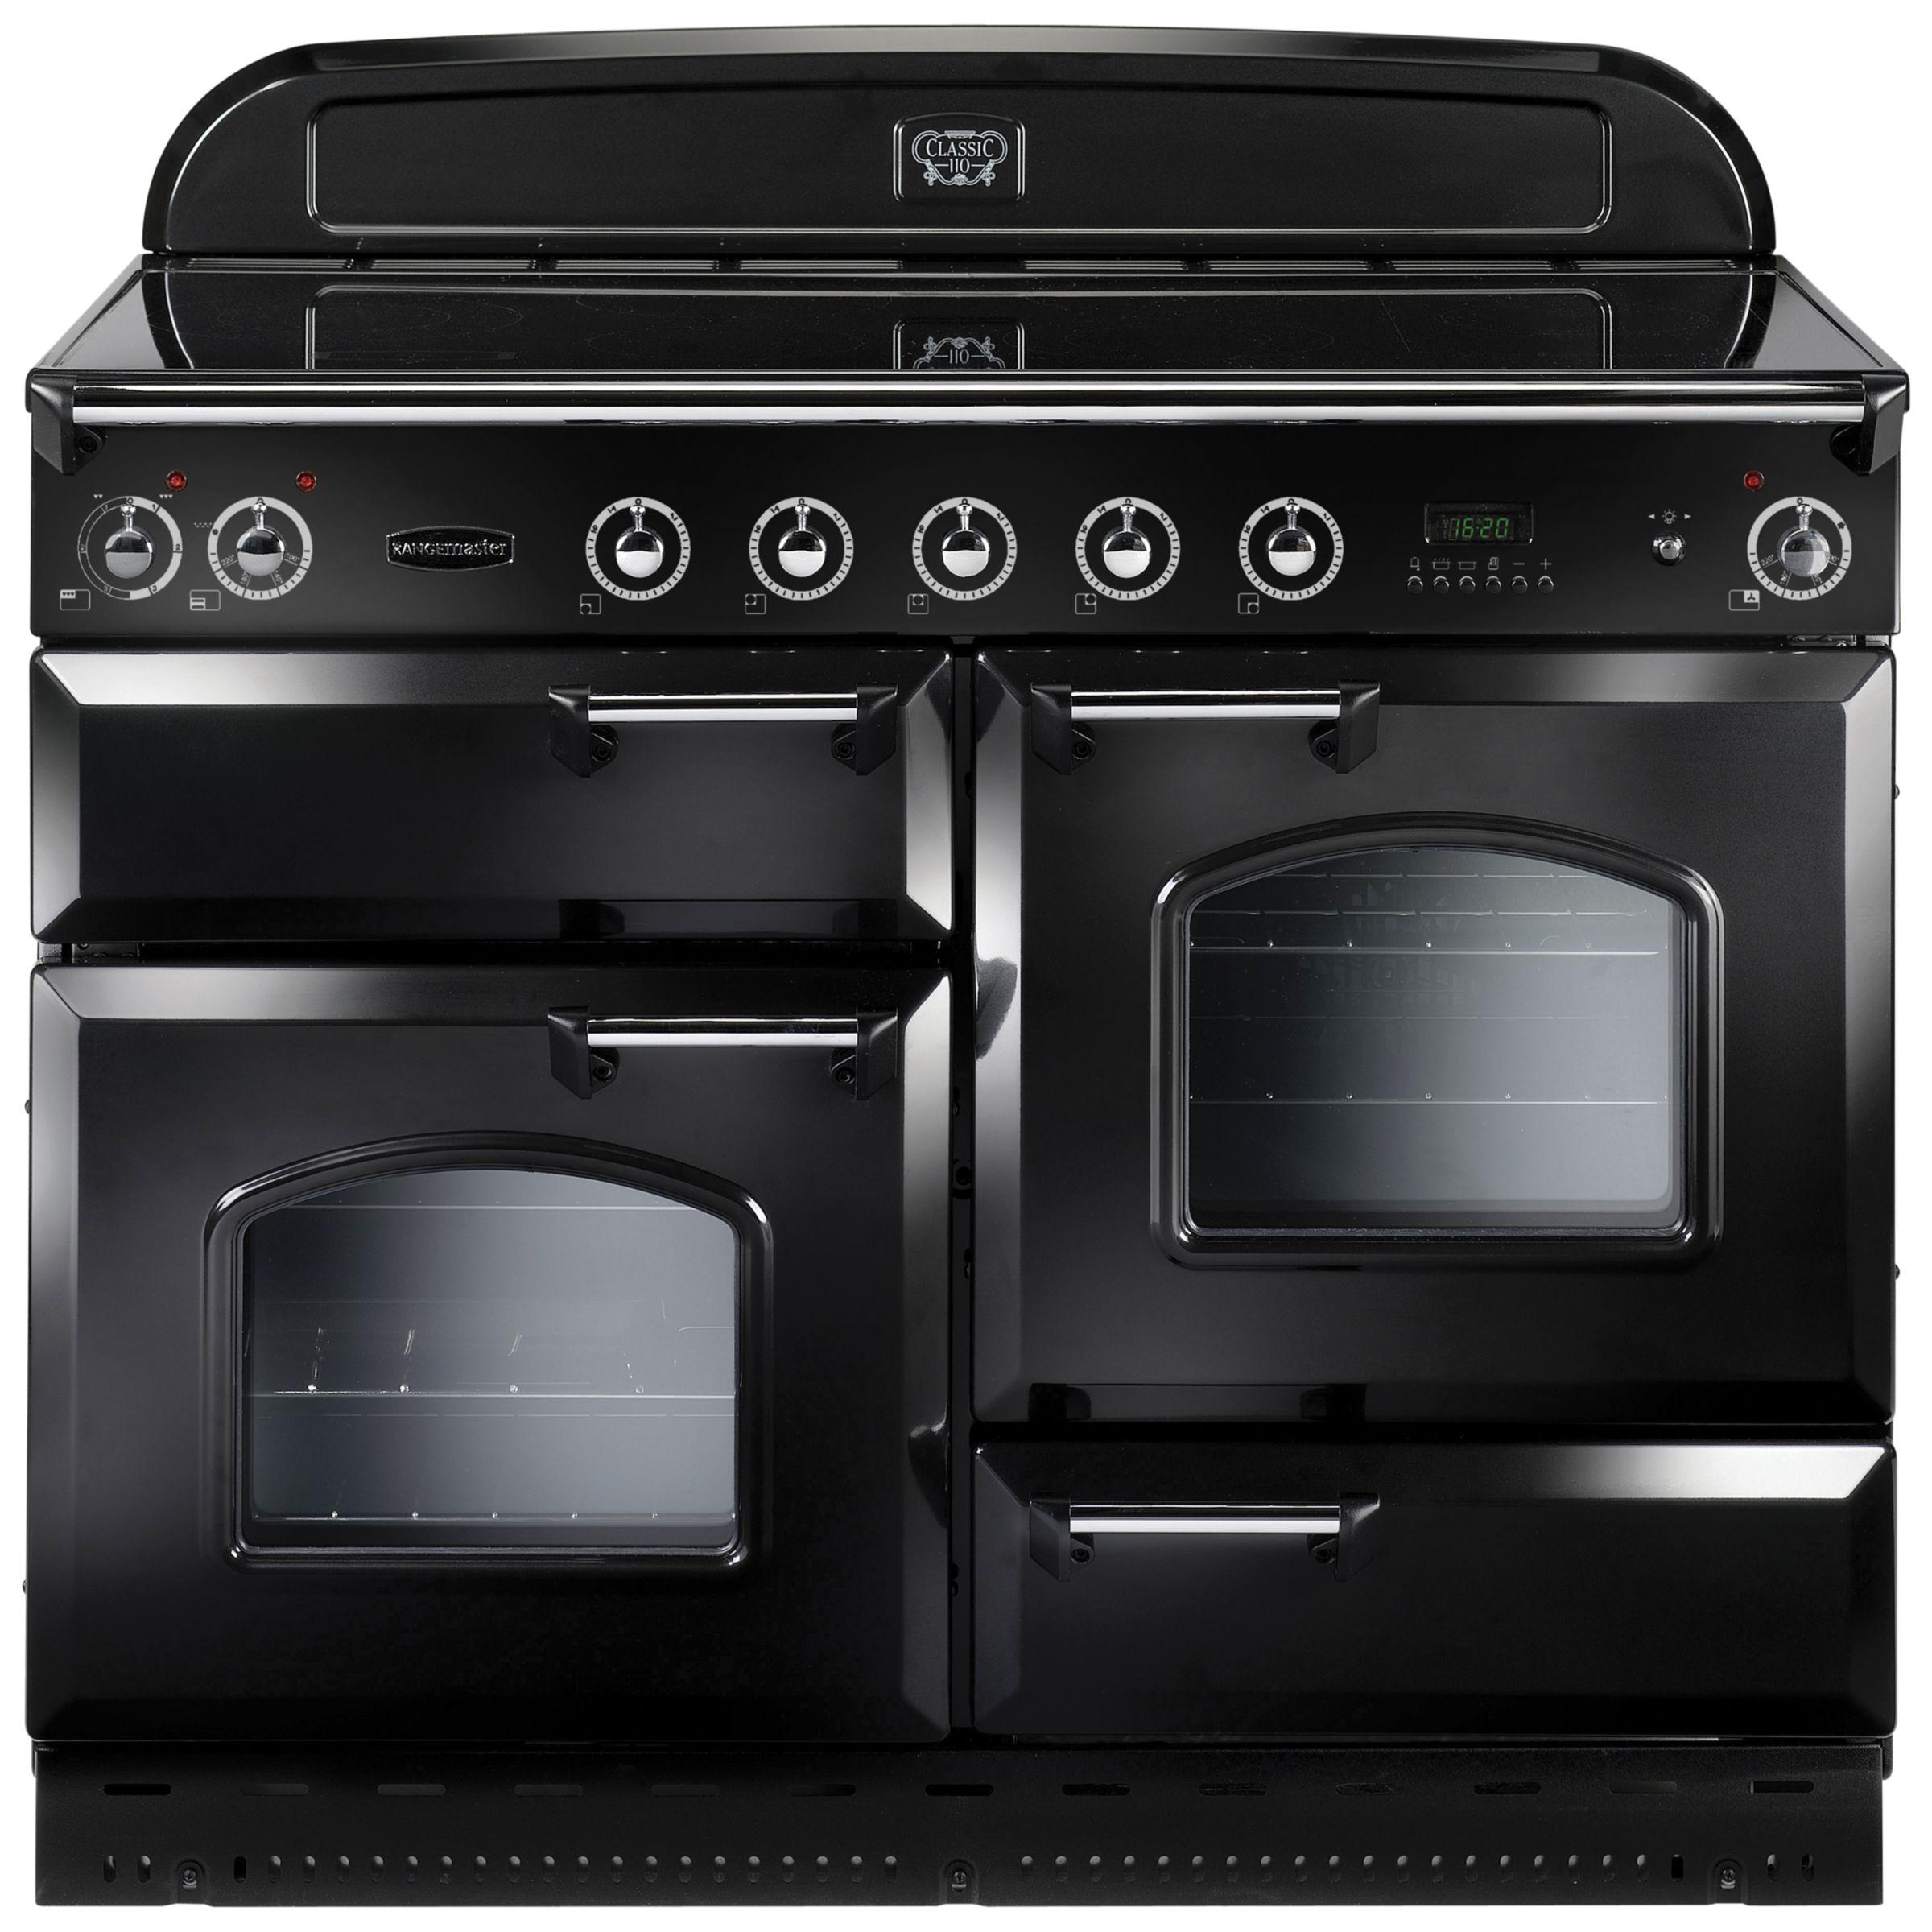 Rangemaster Classic 110 Induction Hob Range Cooker Black